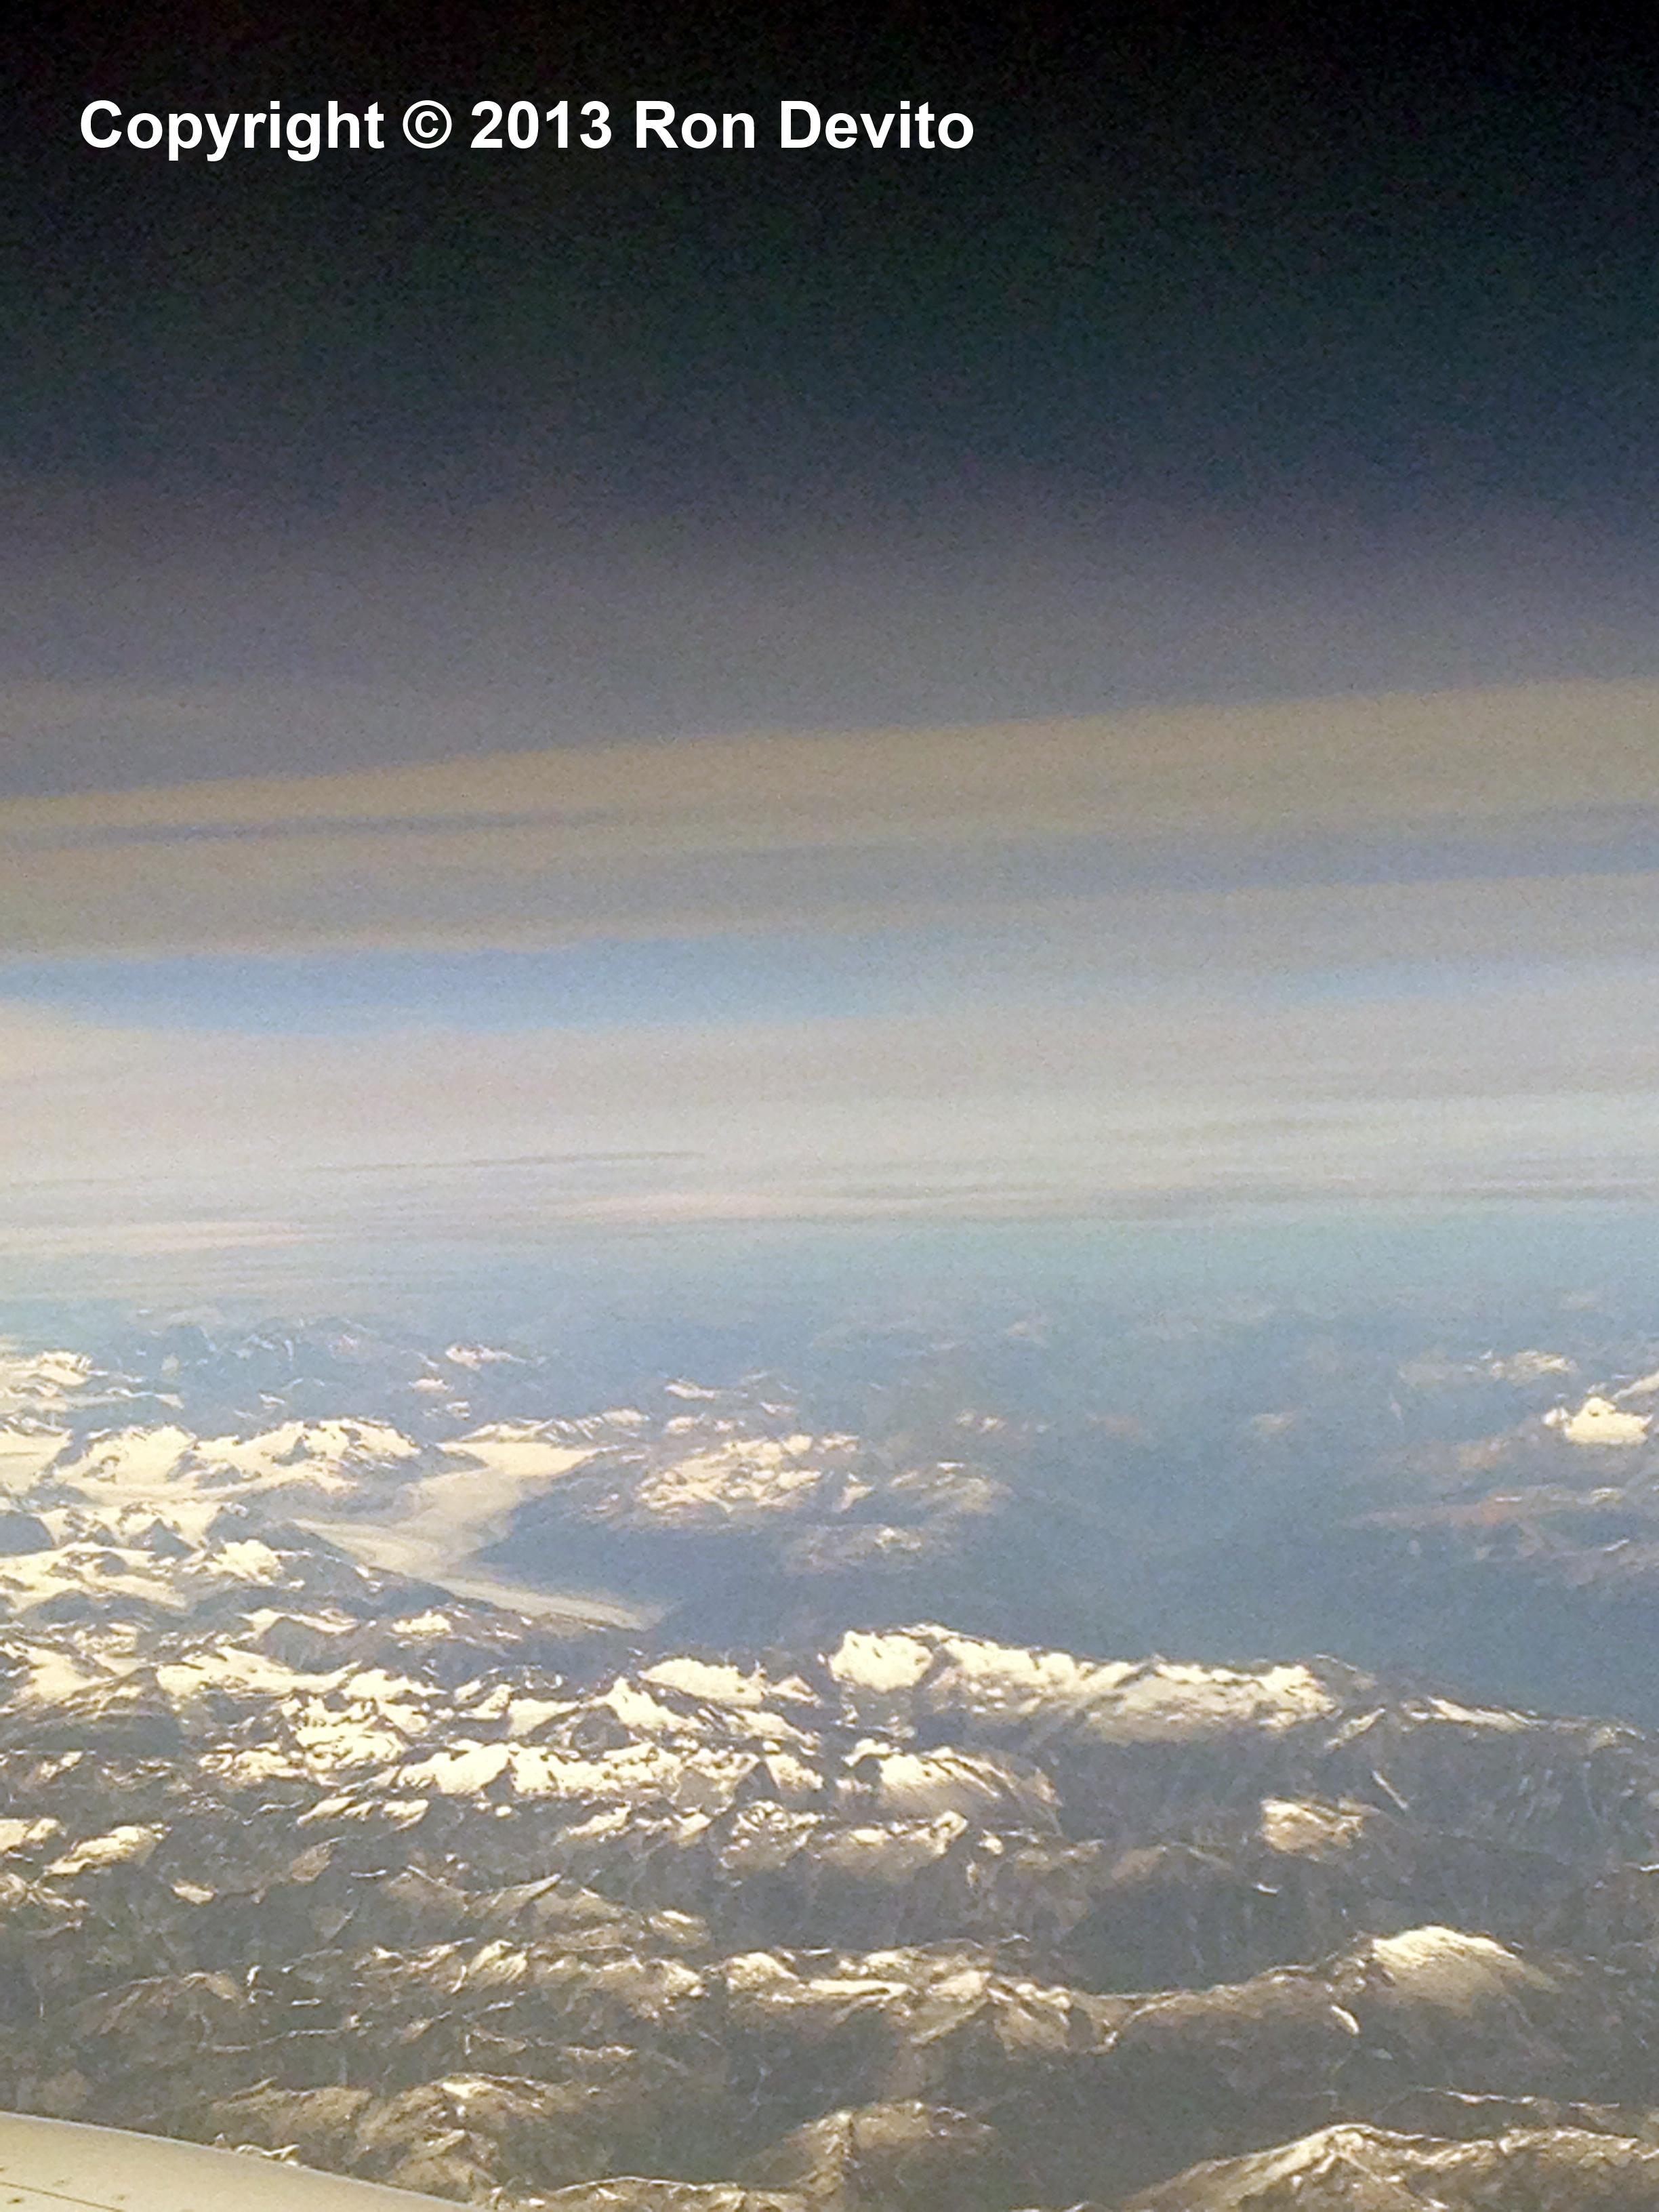 Glaciers just north of Vancouver, British Columbia.